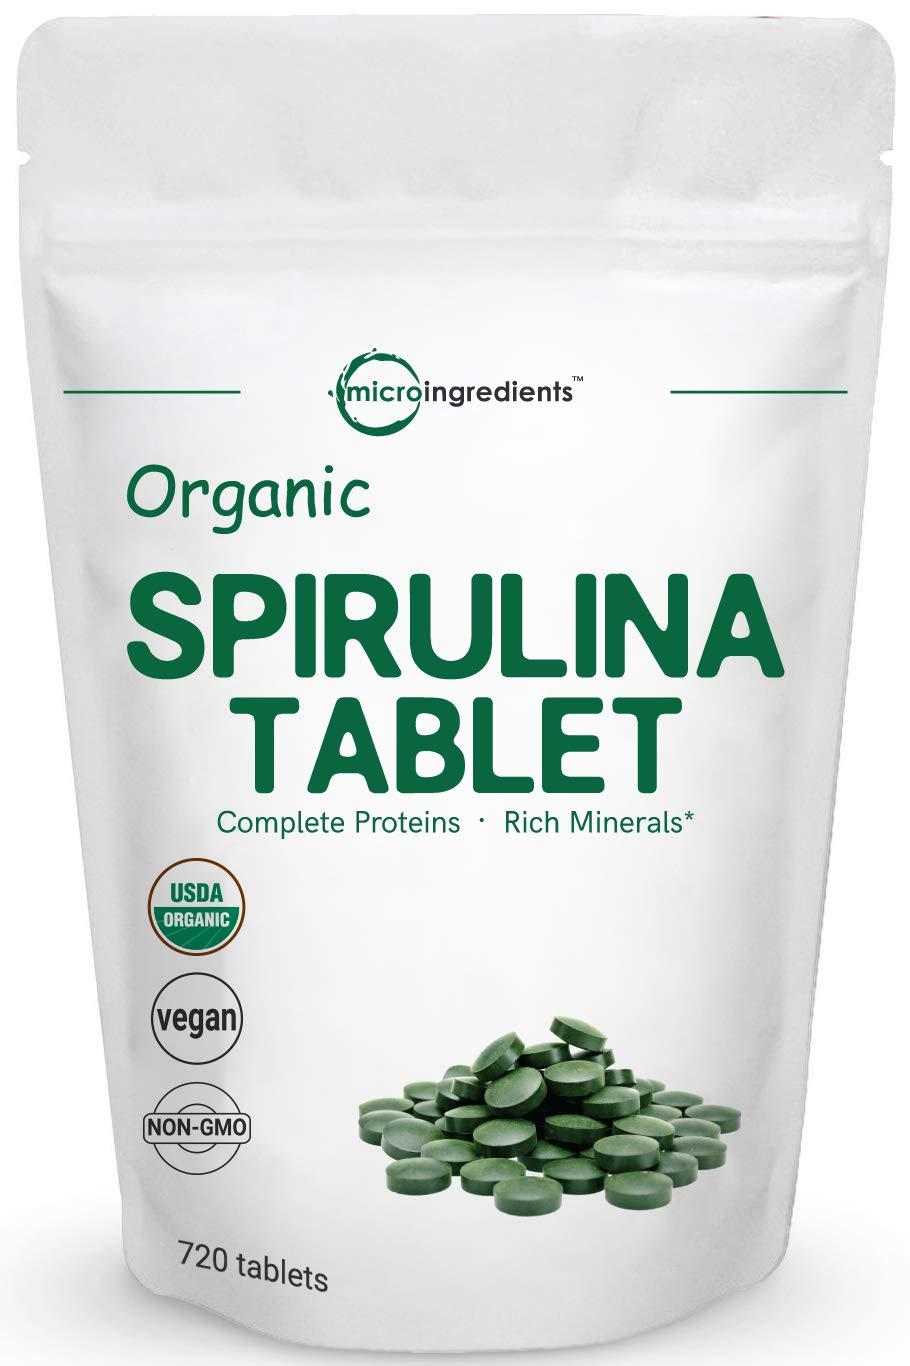 Organic Spirulina Supplement (Spirulina Organic), 3000MG Per Serving, 720 Tablets (4 Month Supply), Rich in Prebiotics, Immune Vitamins, Chlorophyll, Fiber, Proteins & Support Immune System